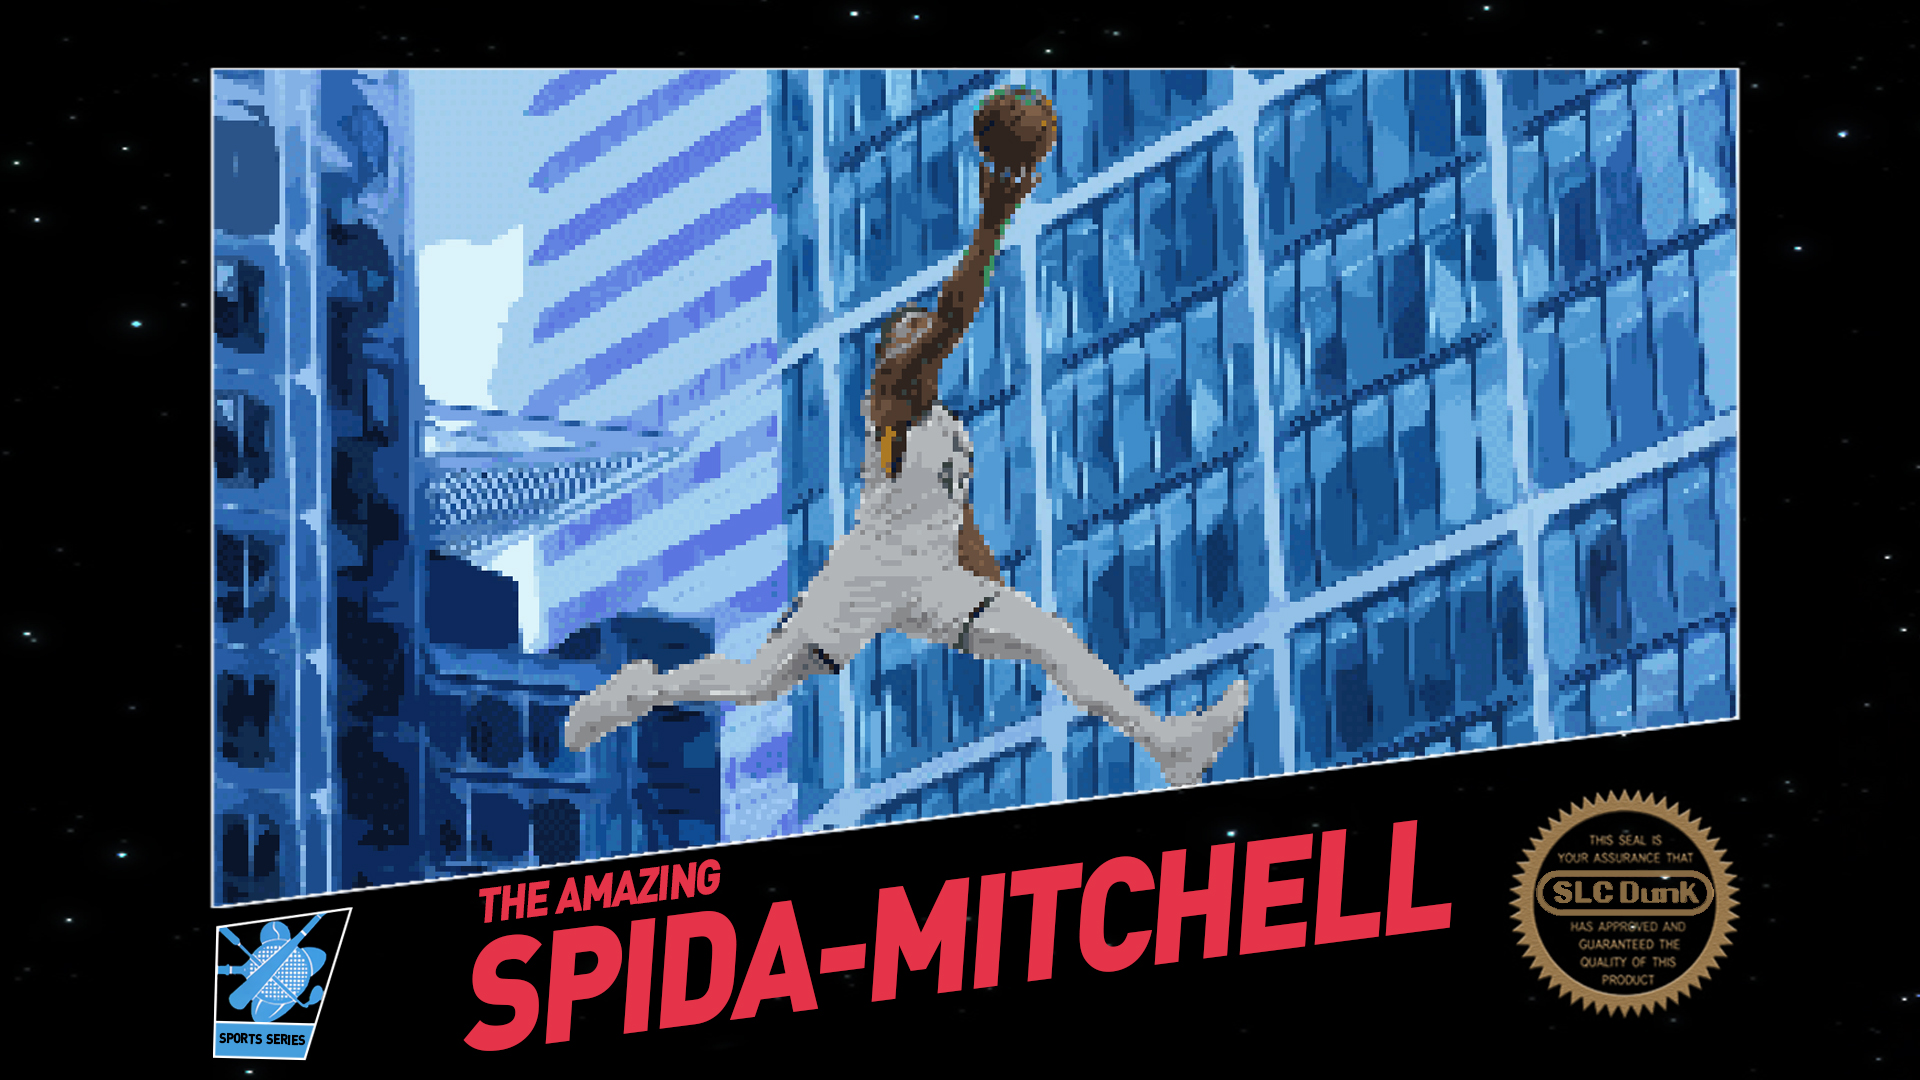 8 Bit NBA - SLC Dunk